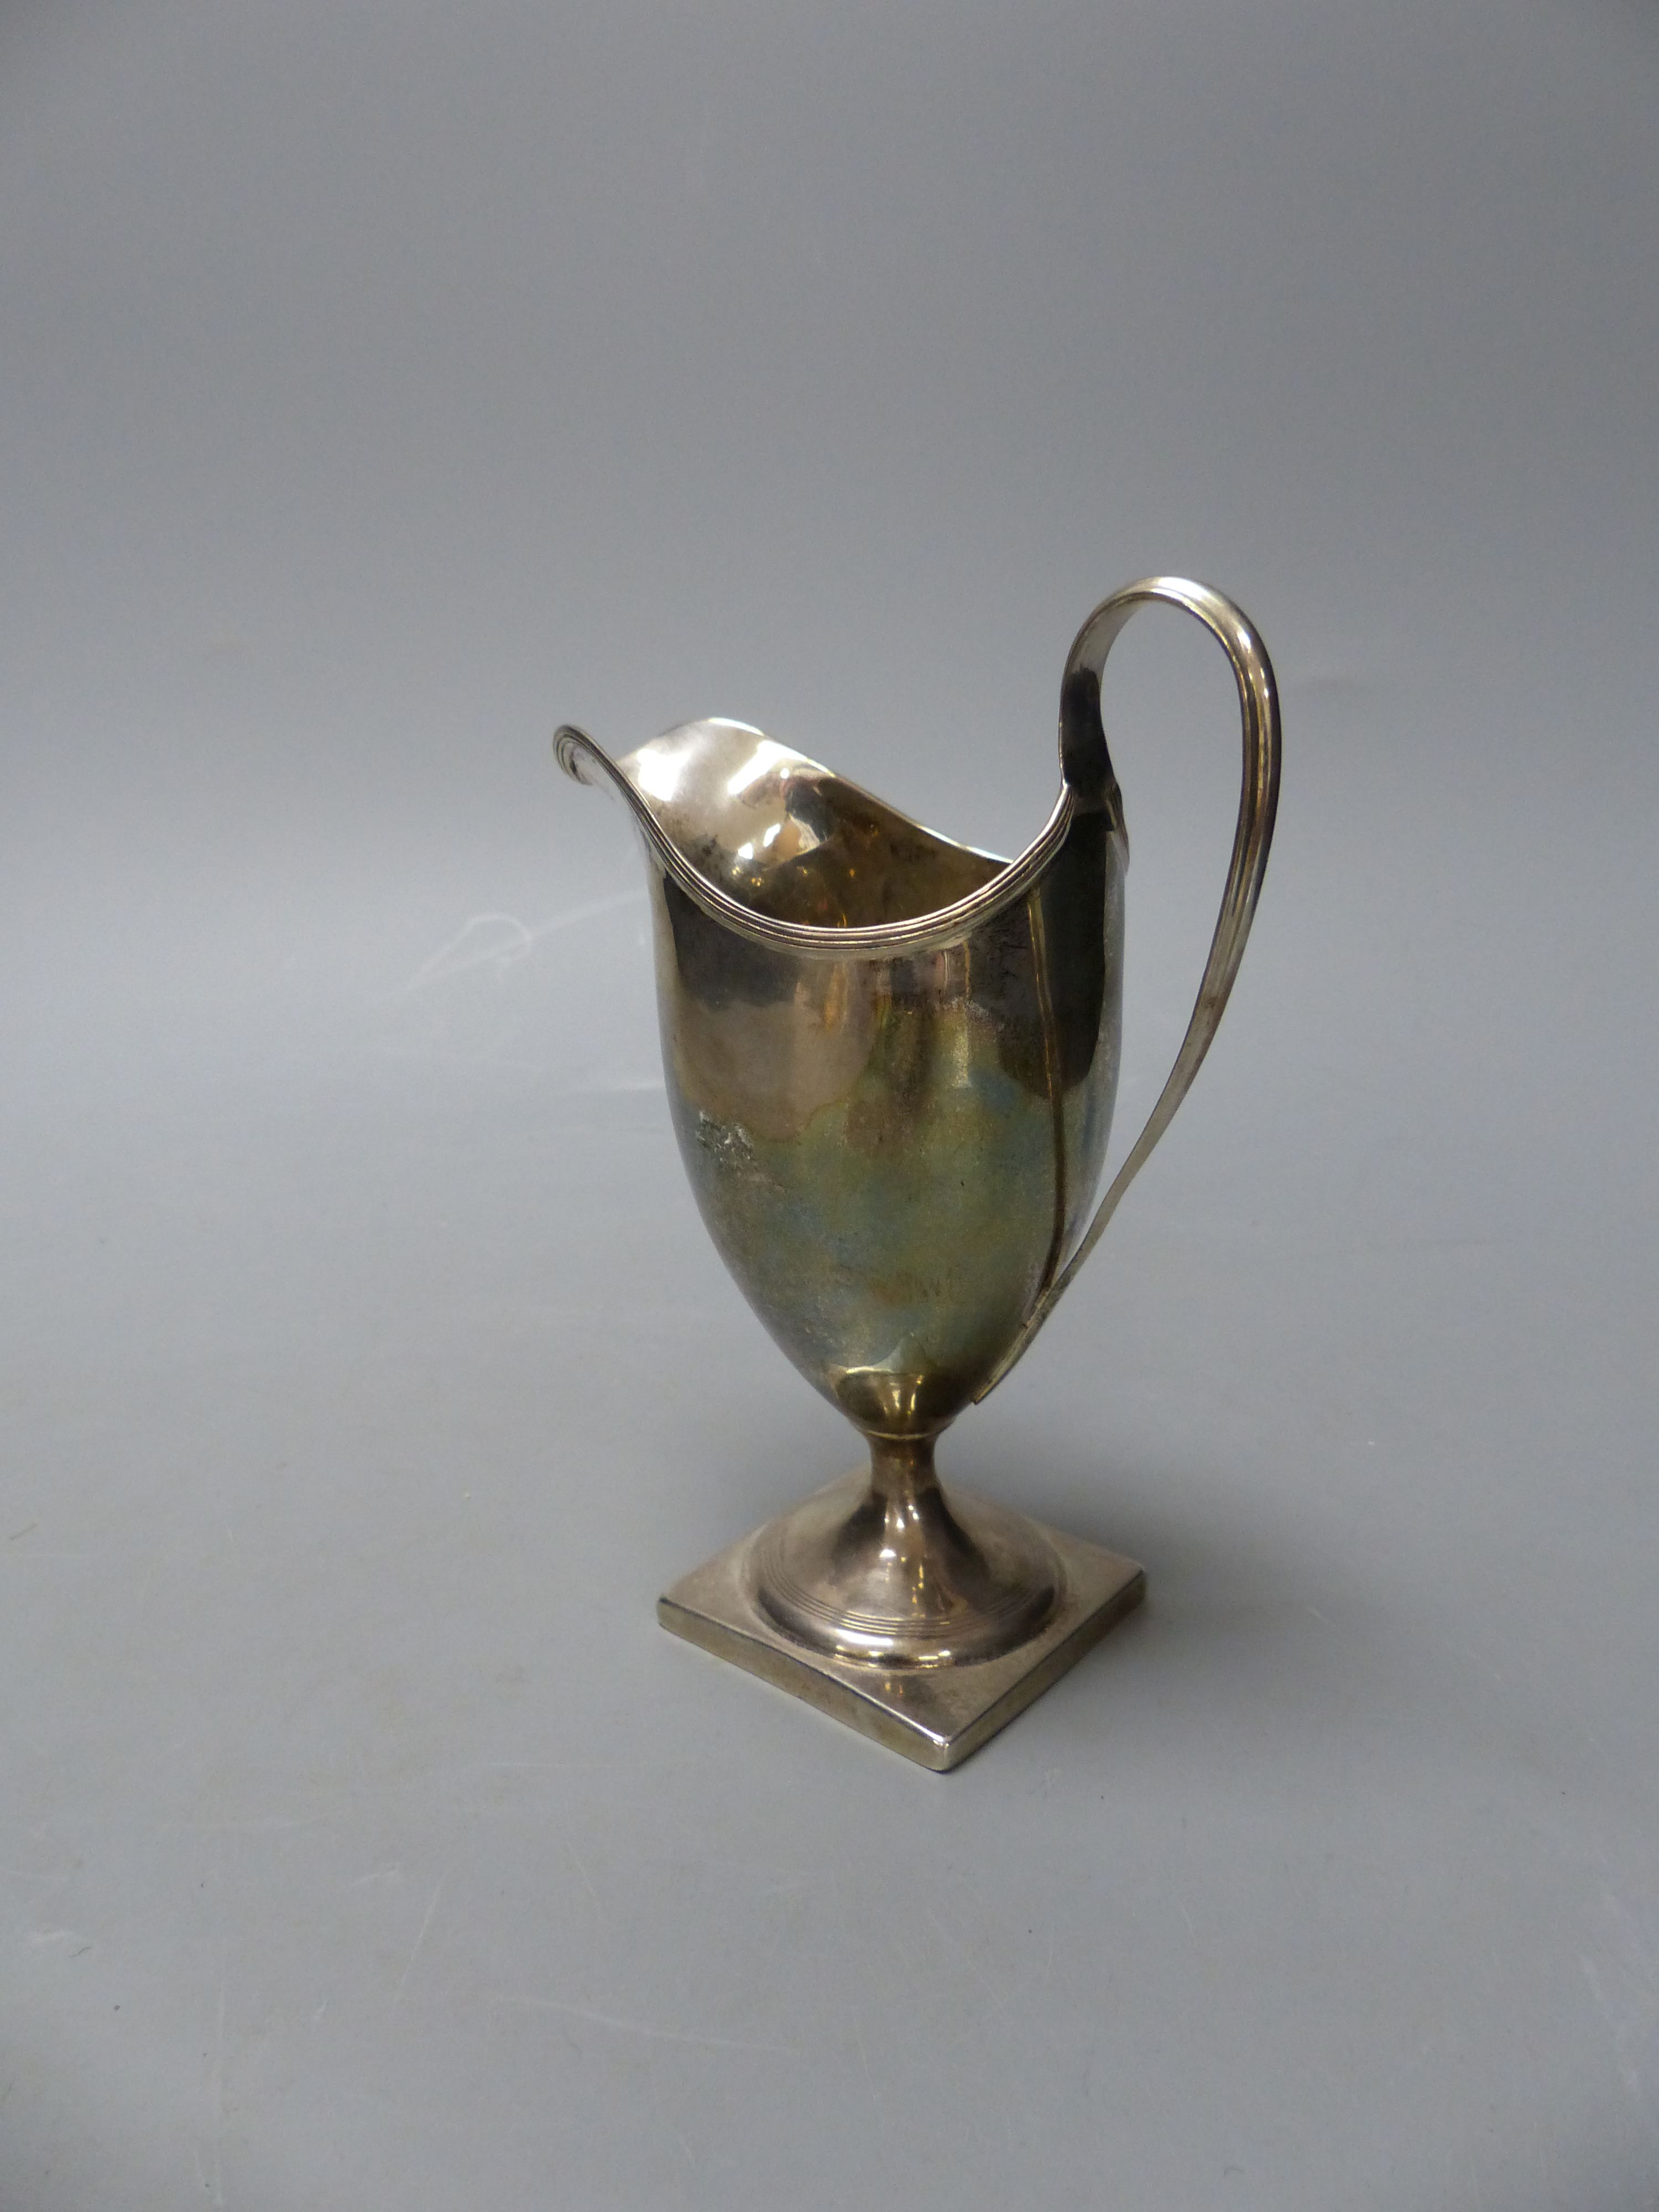 A George III silver helmet shaped cream jug, I.B, London, 1800, 14.9cm,114 grams. - Image 4 of 4